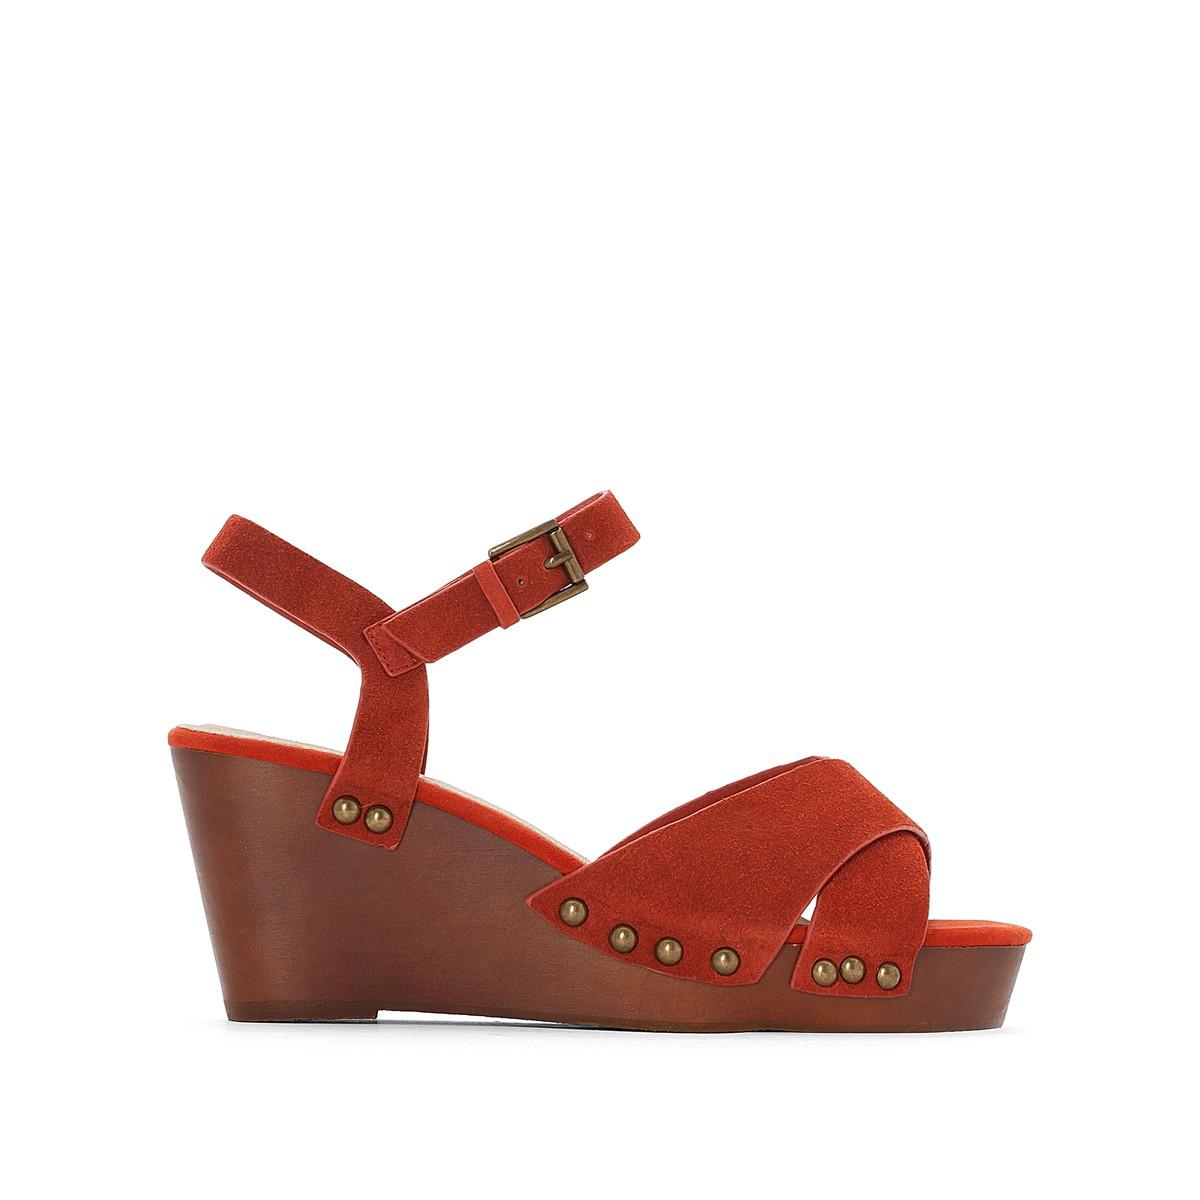 7900d4357de Γυναικείες Πλατφόρμες ⋆ EliteShoes.gr ⋆ Page 7 of 19